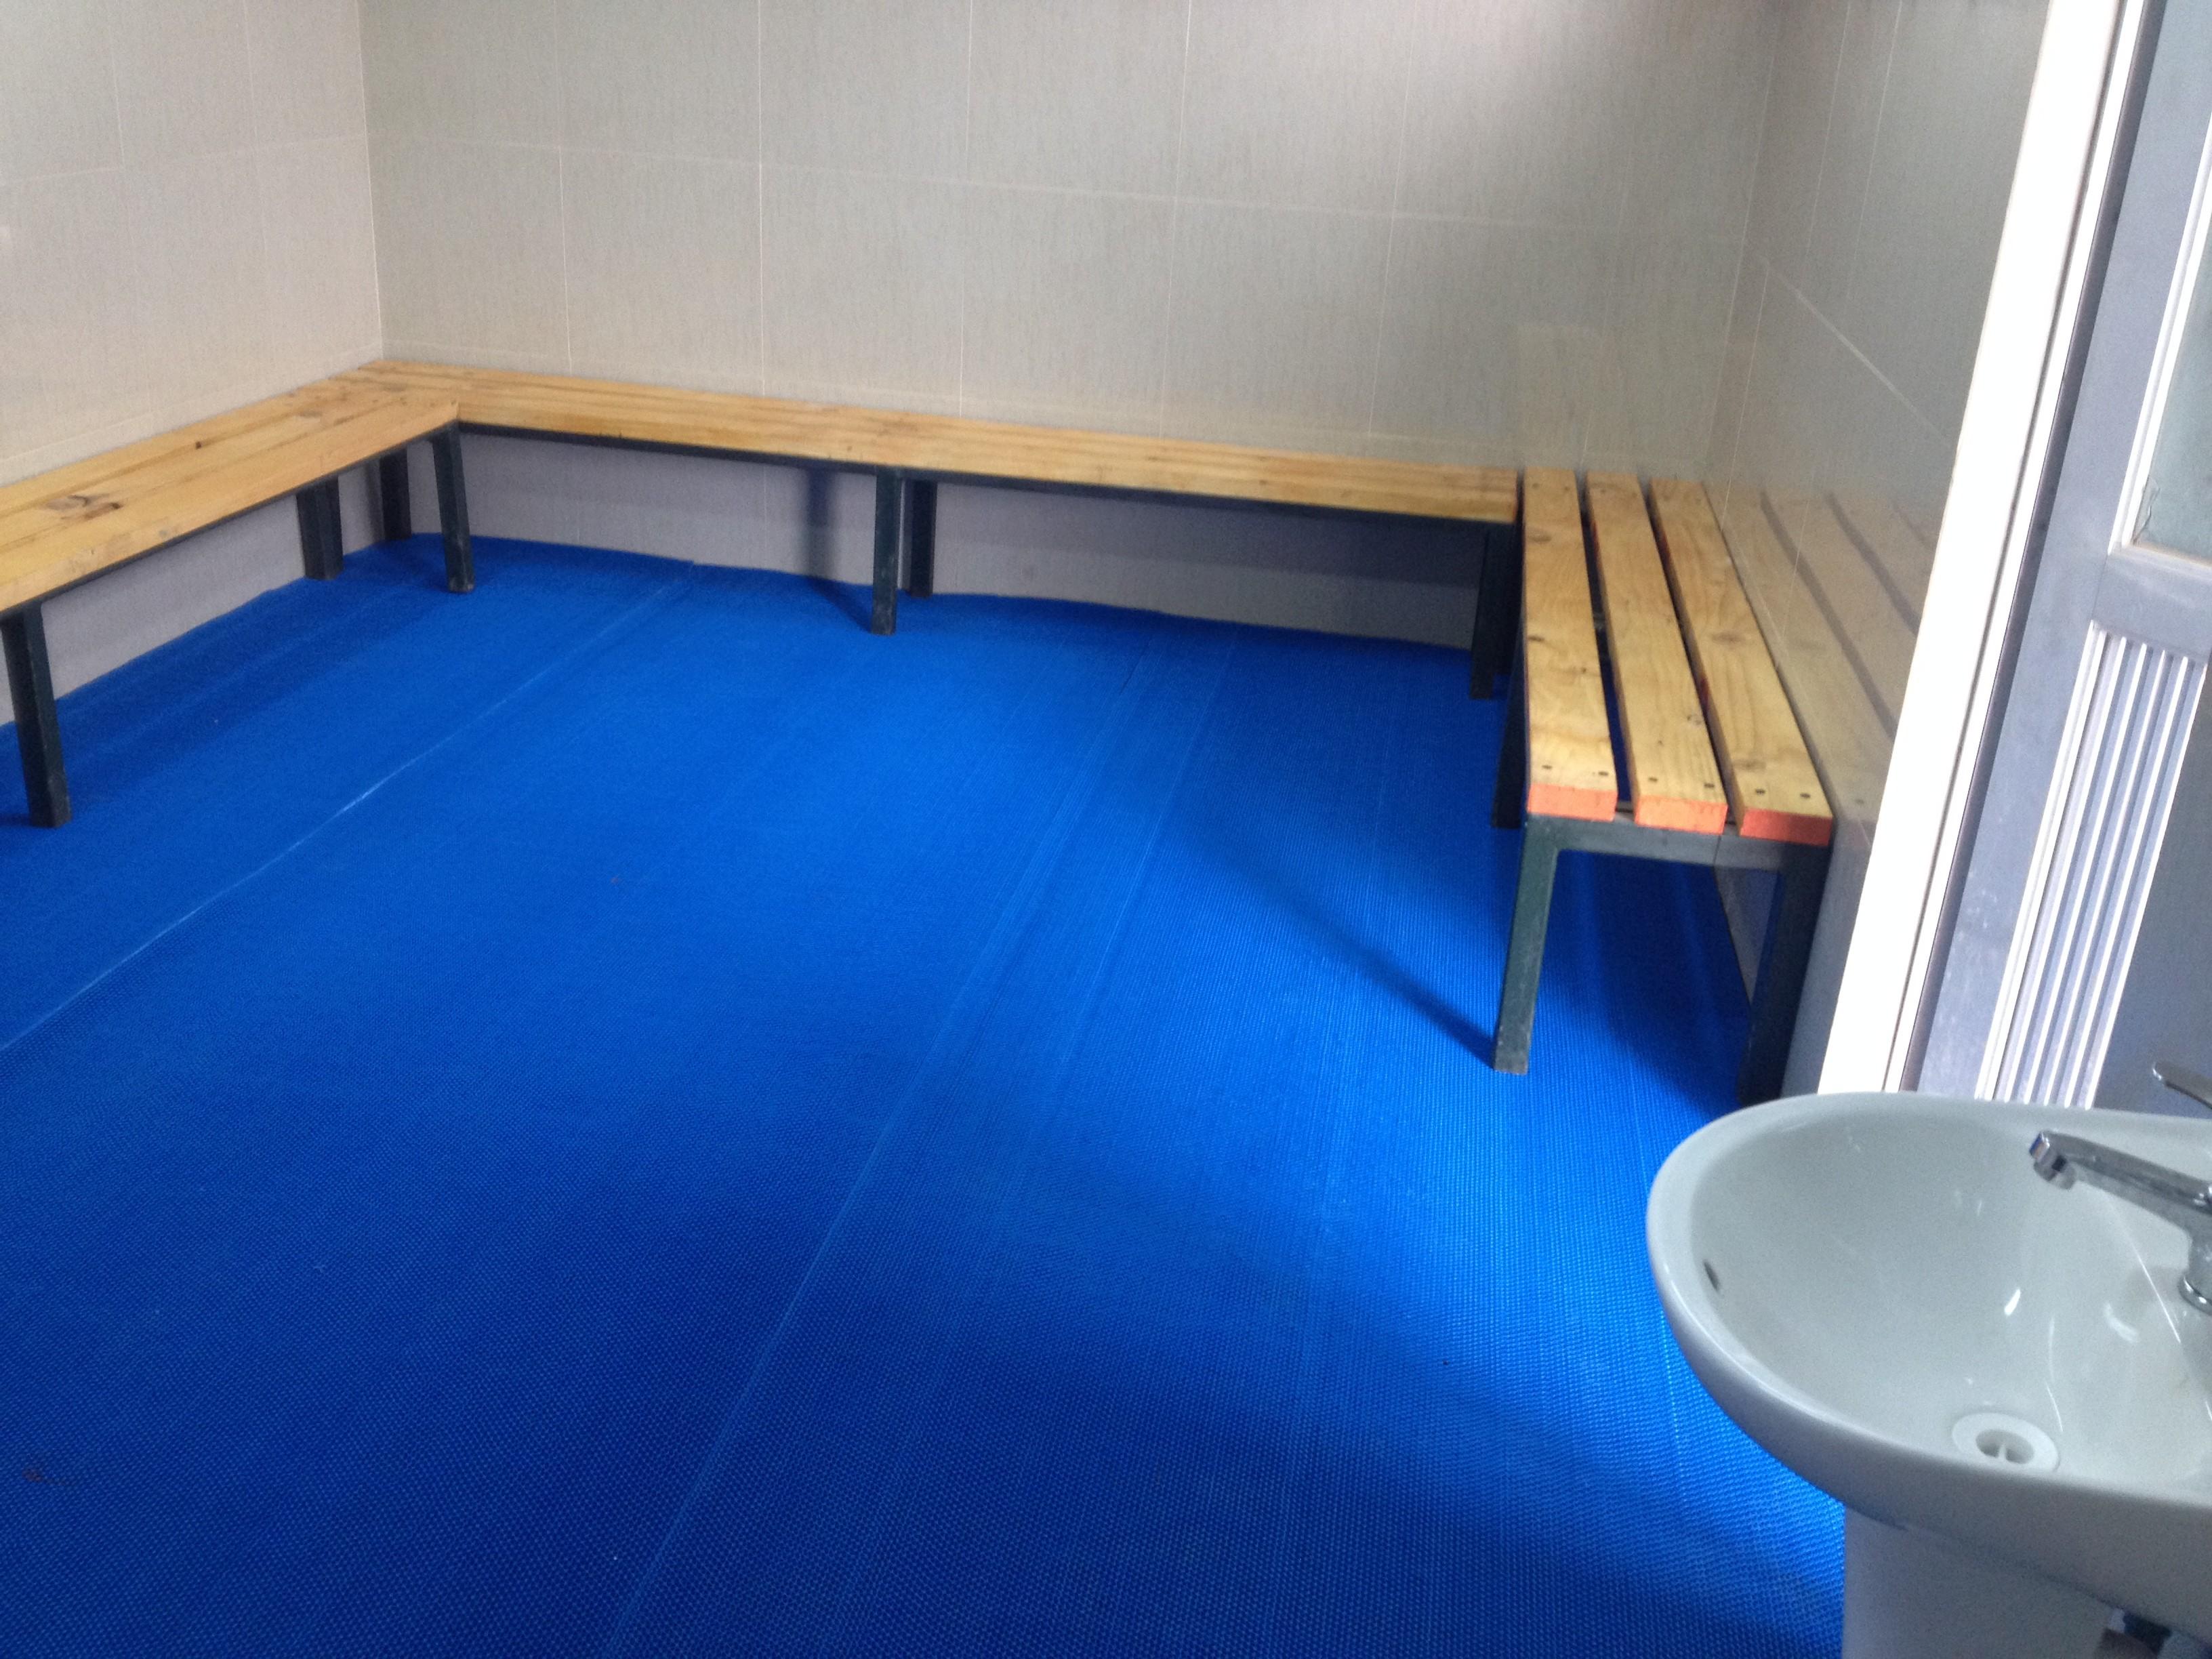 Pisos camarines piso tipo wet area vinil 5 mm x 1 20 mts - Piso de vinil en rollo ...